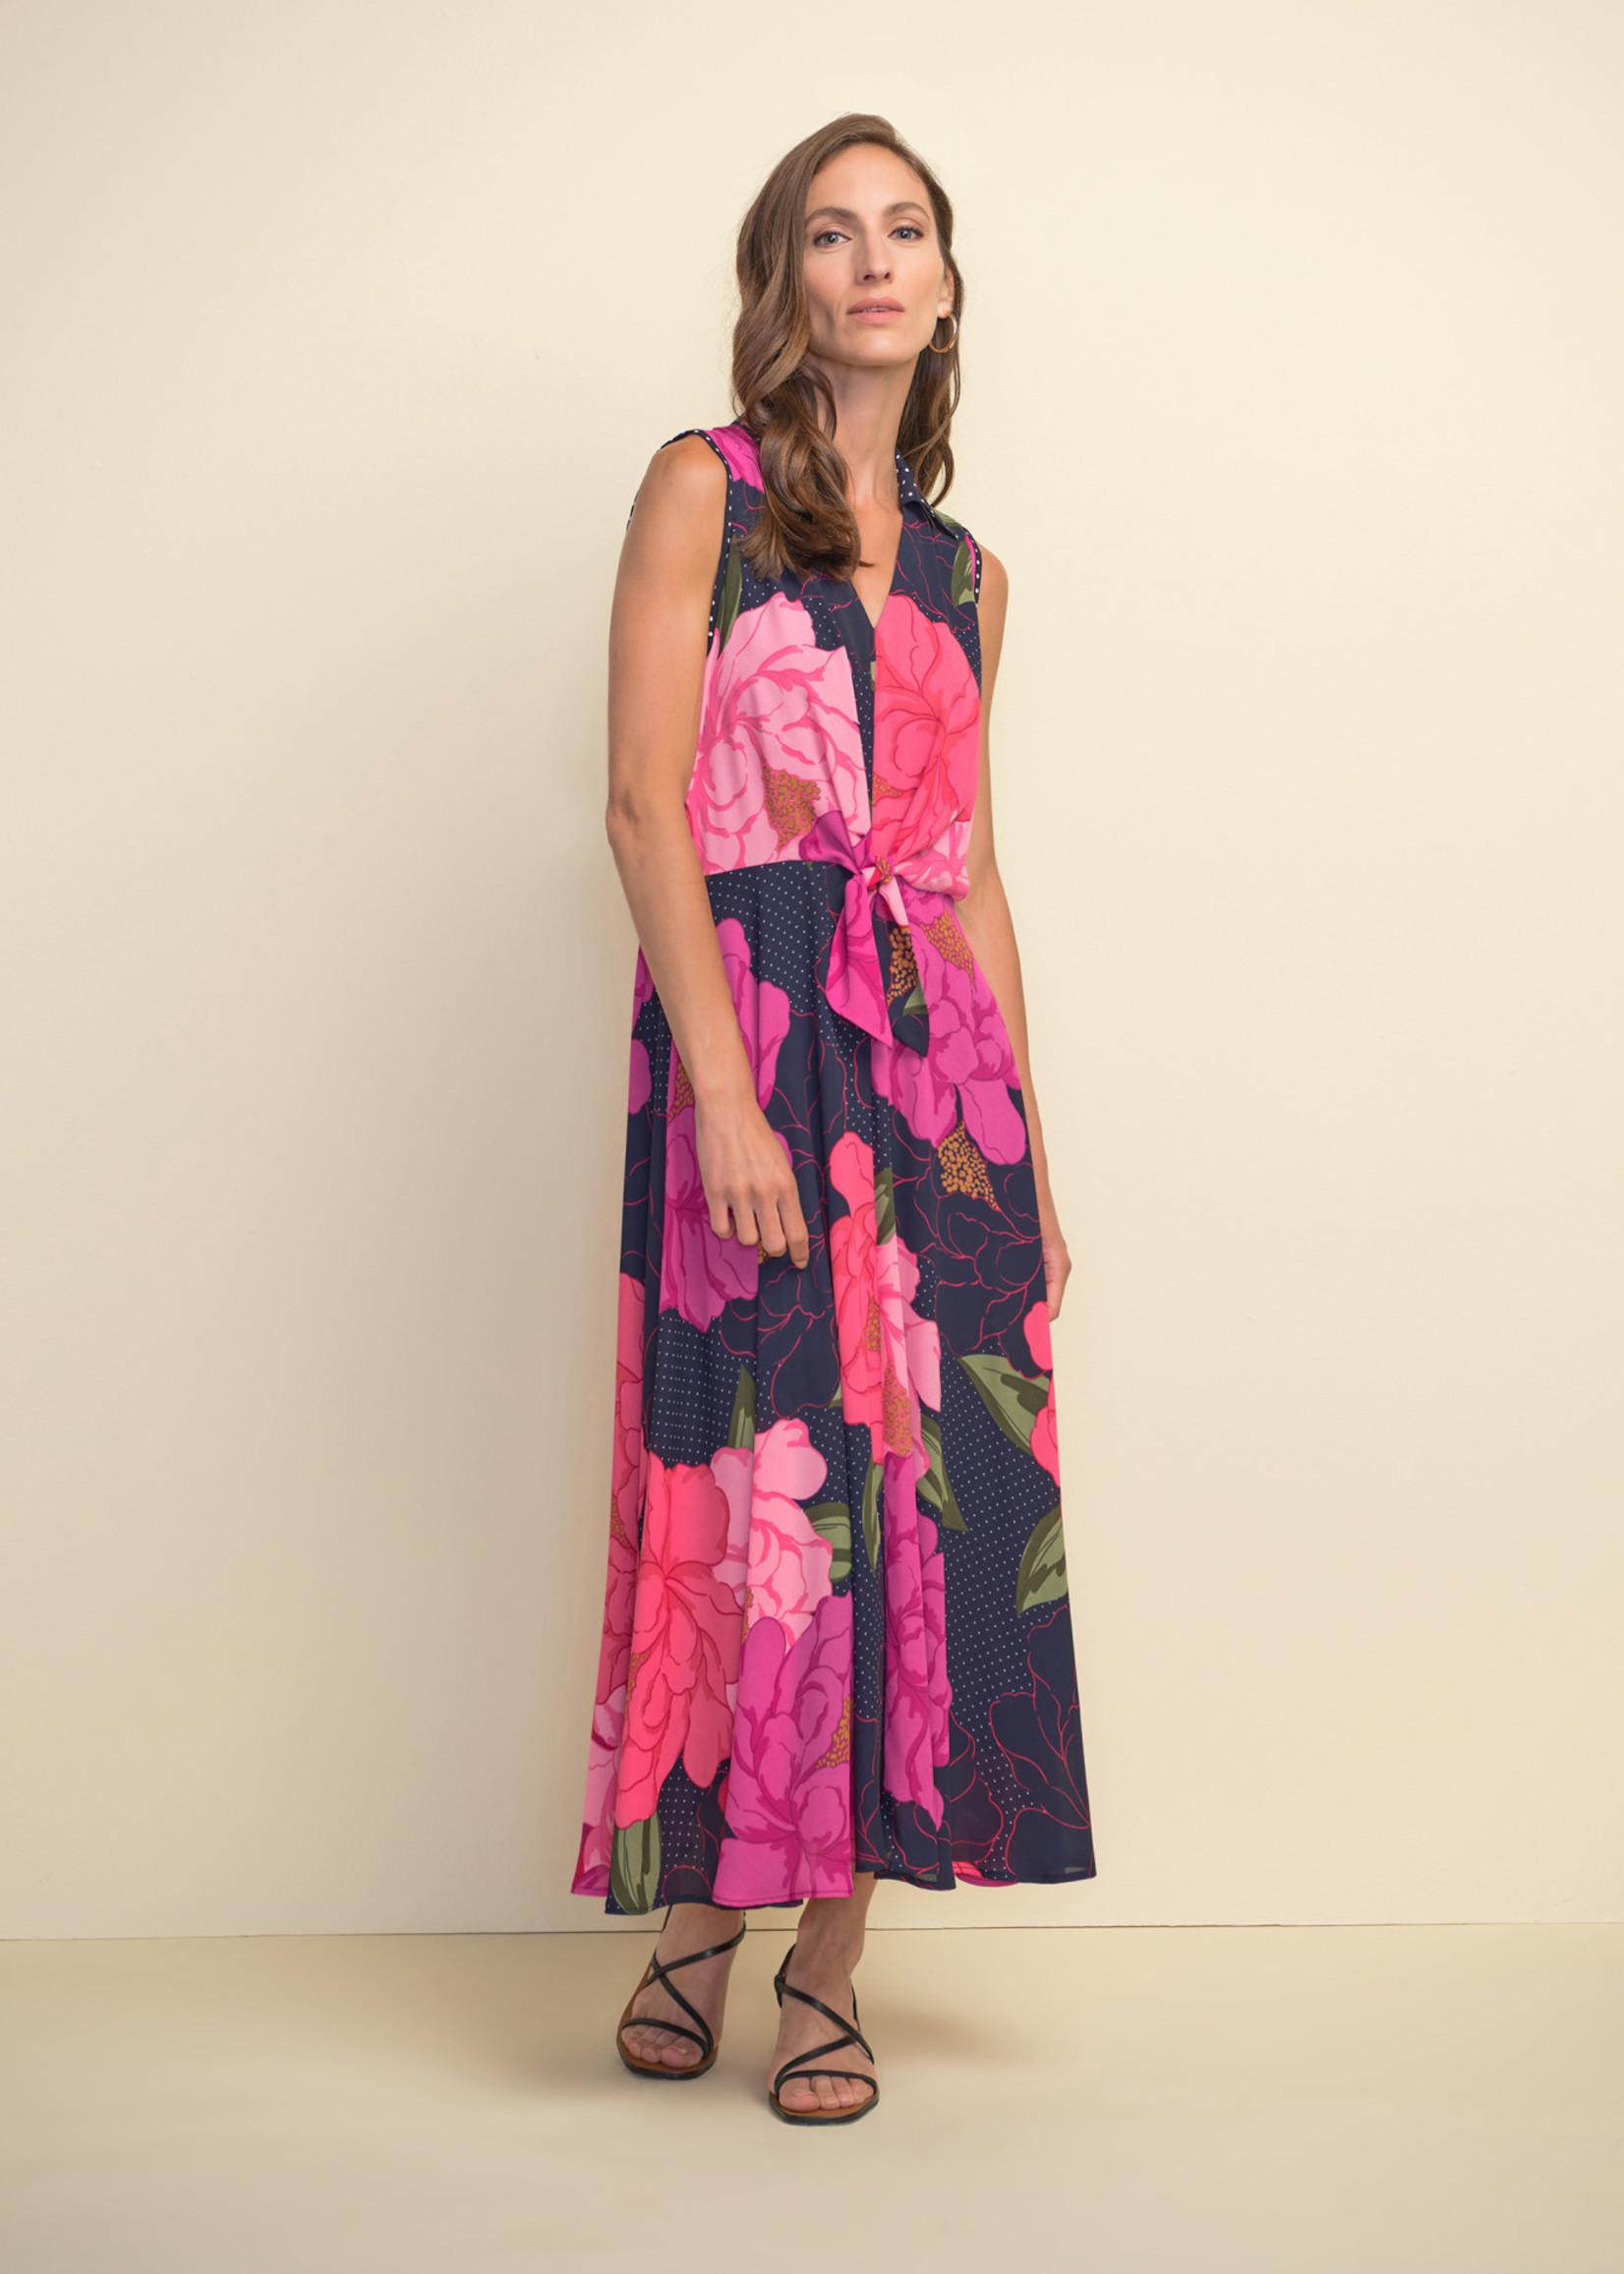 Joseph Ribkoff Joseph Ribkoff Floral and Polka Dot Dress